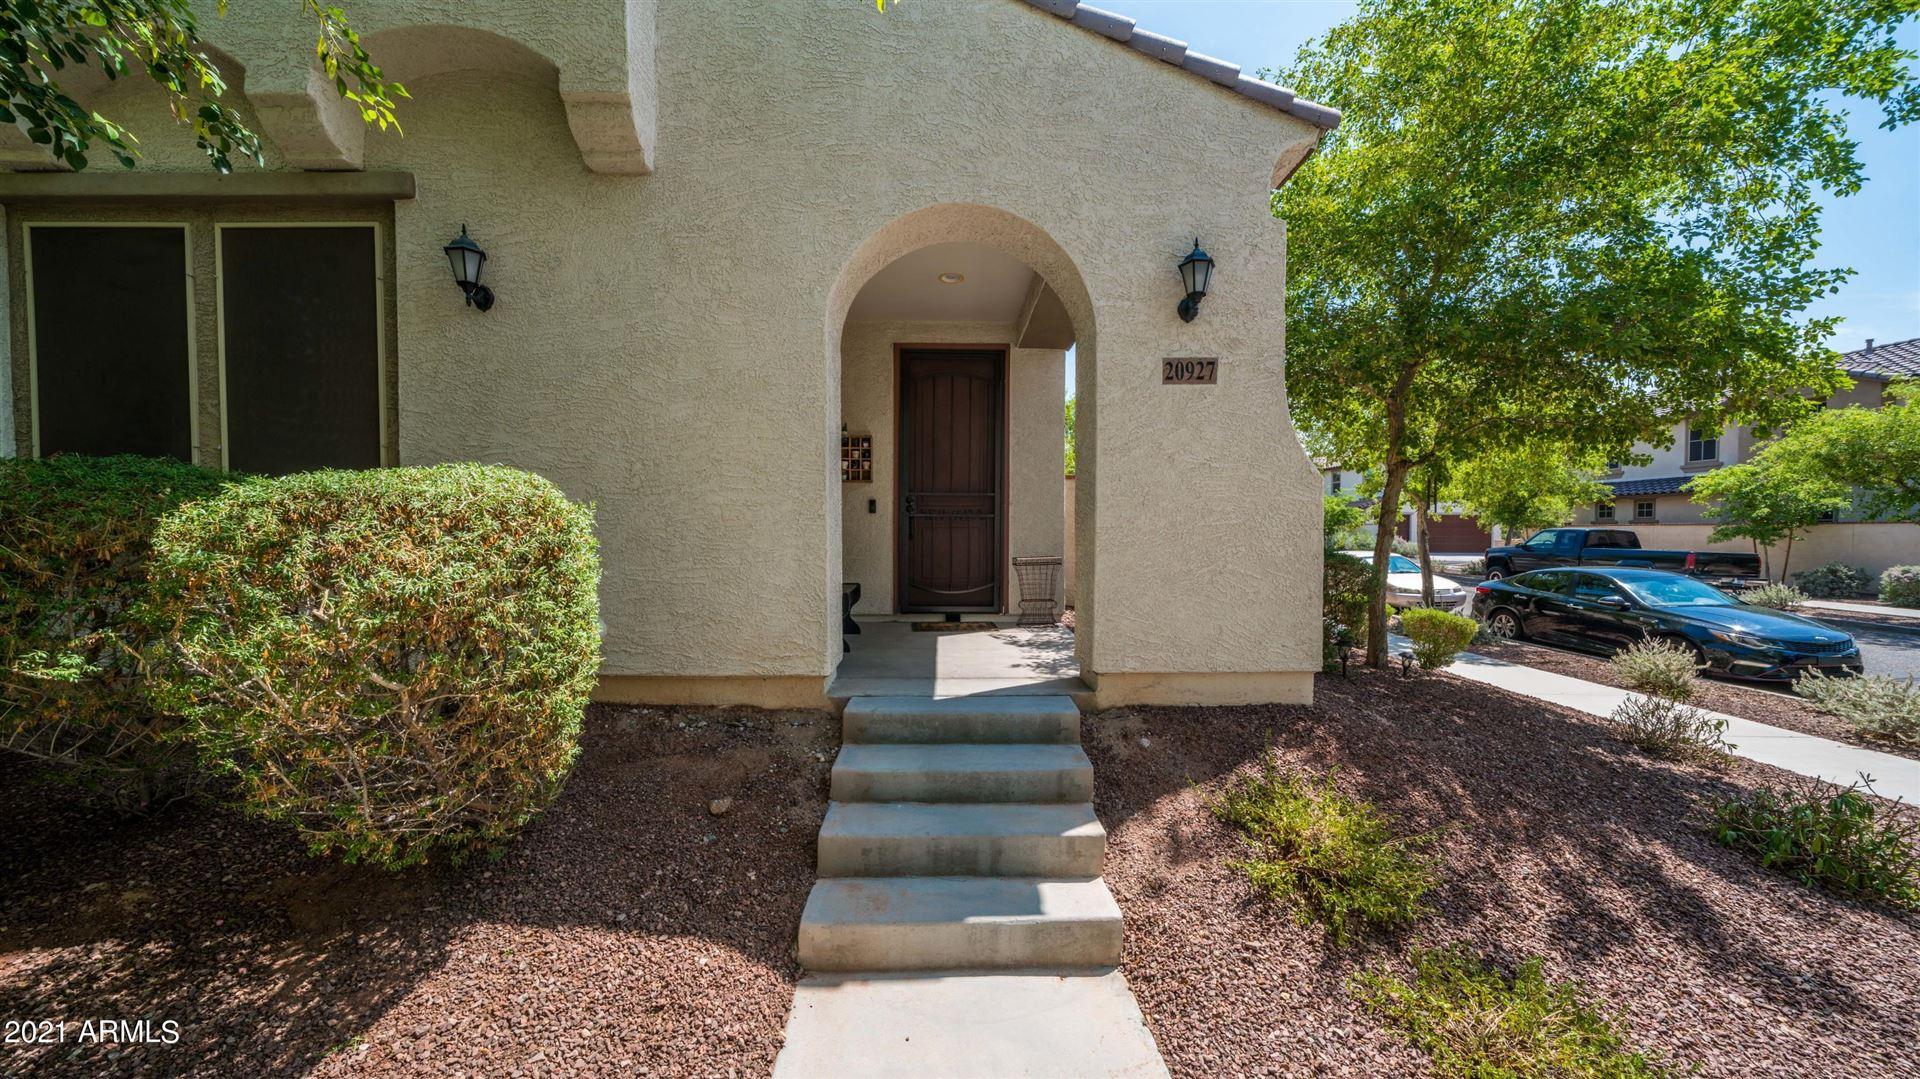 Photo of 20927 W HAMILTON Street, Buckeye, AZ 85396 (MLS # 6268074)